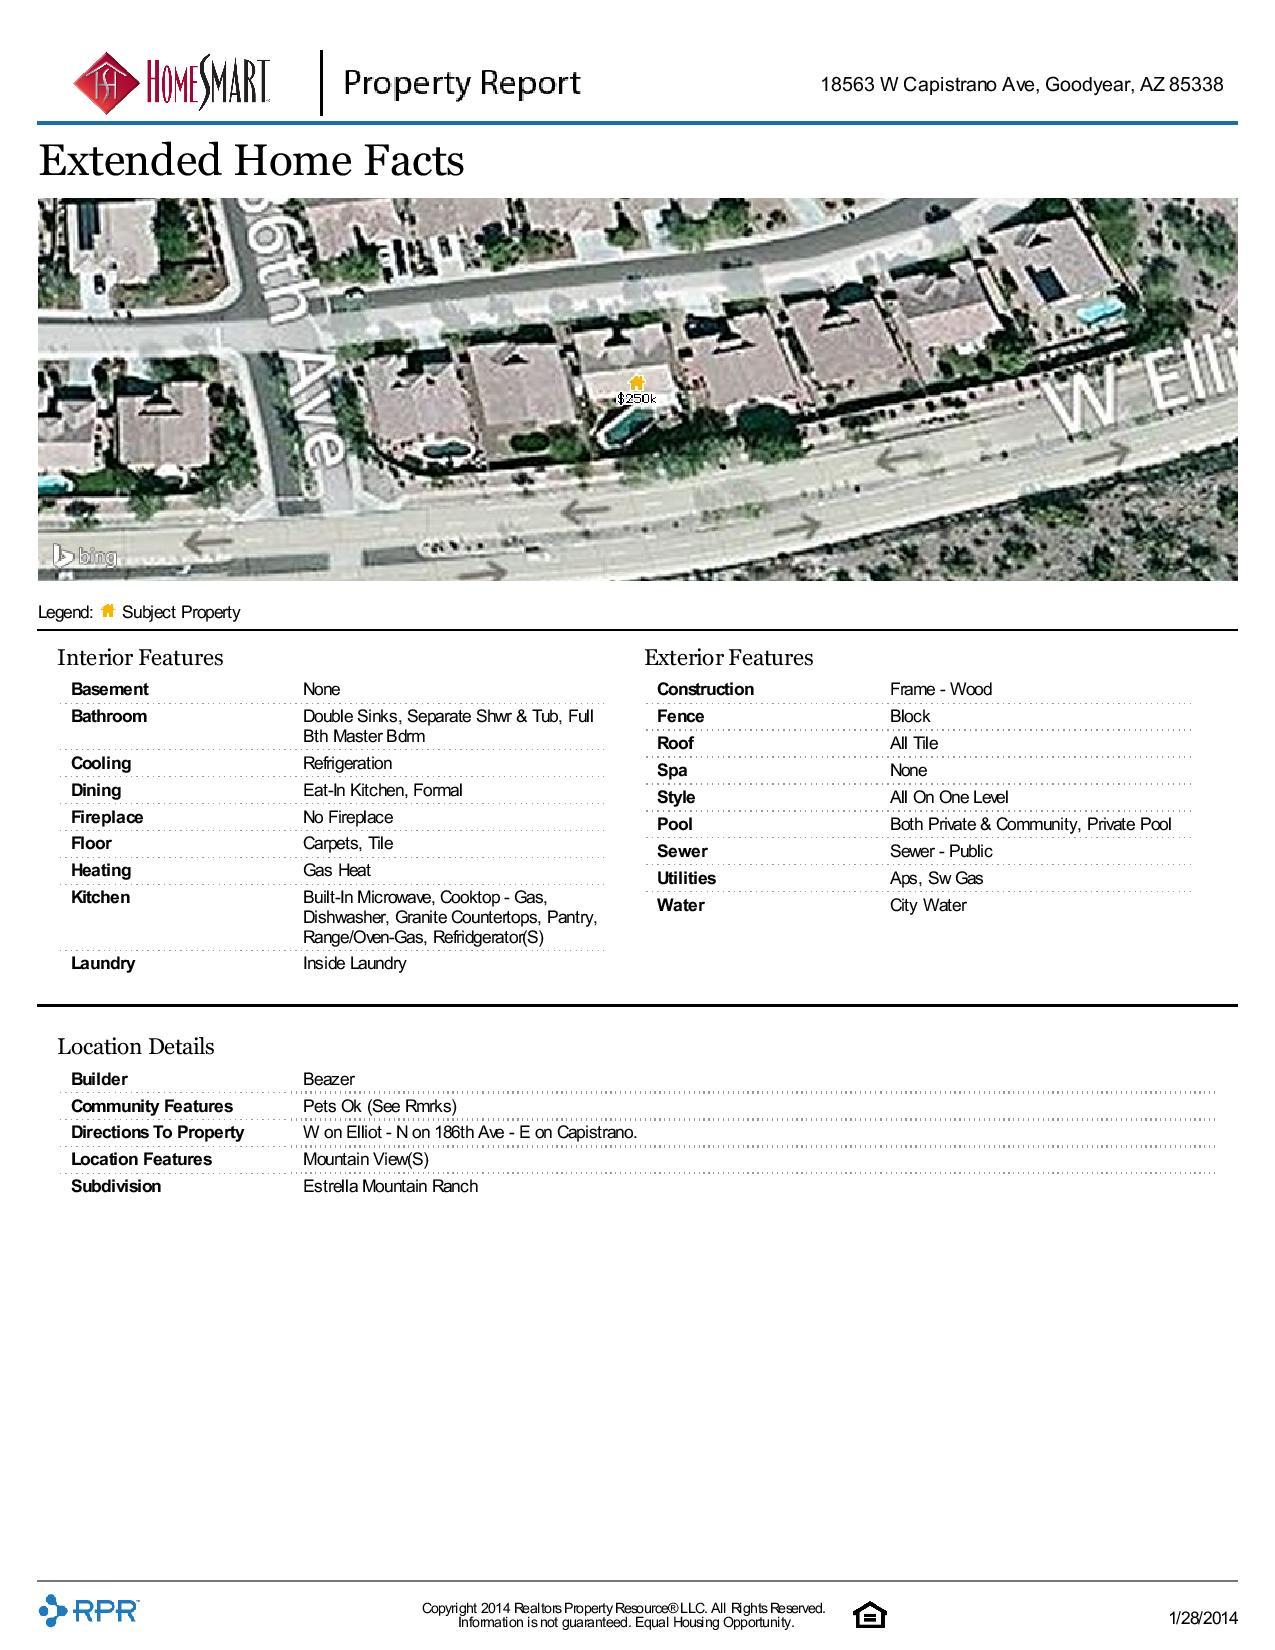 18563-W-Capistrano-Ave-Goodyear-AZ-85338.pdf-page-004